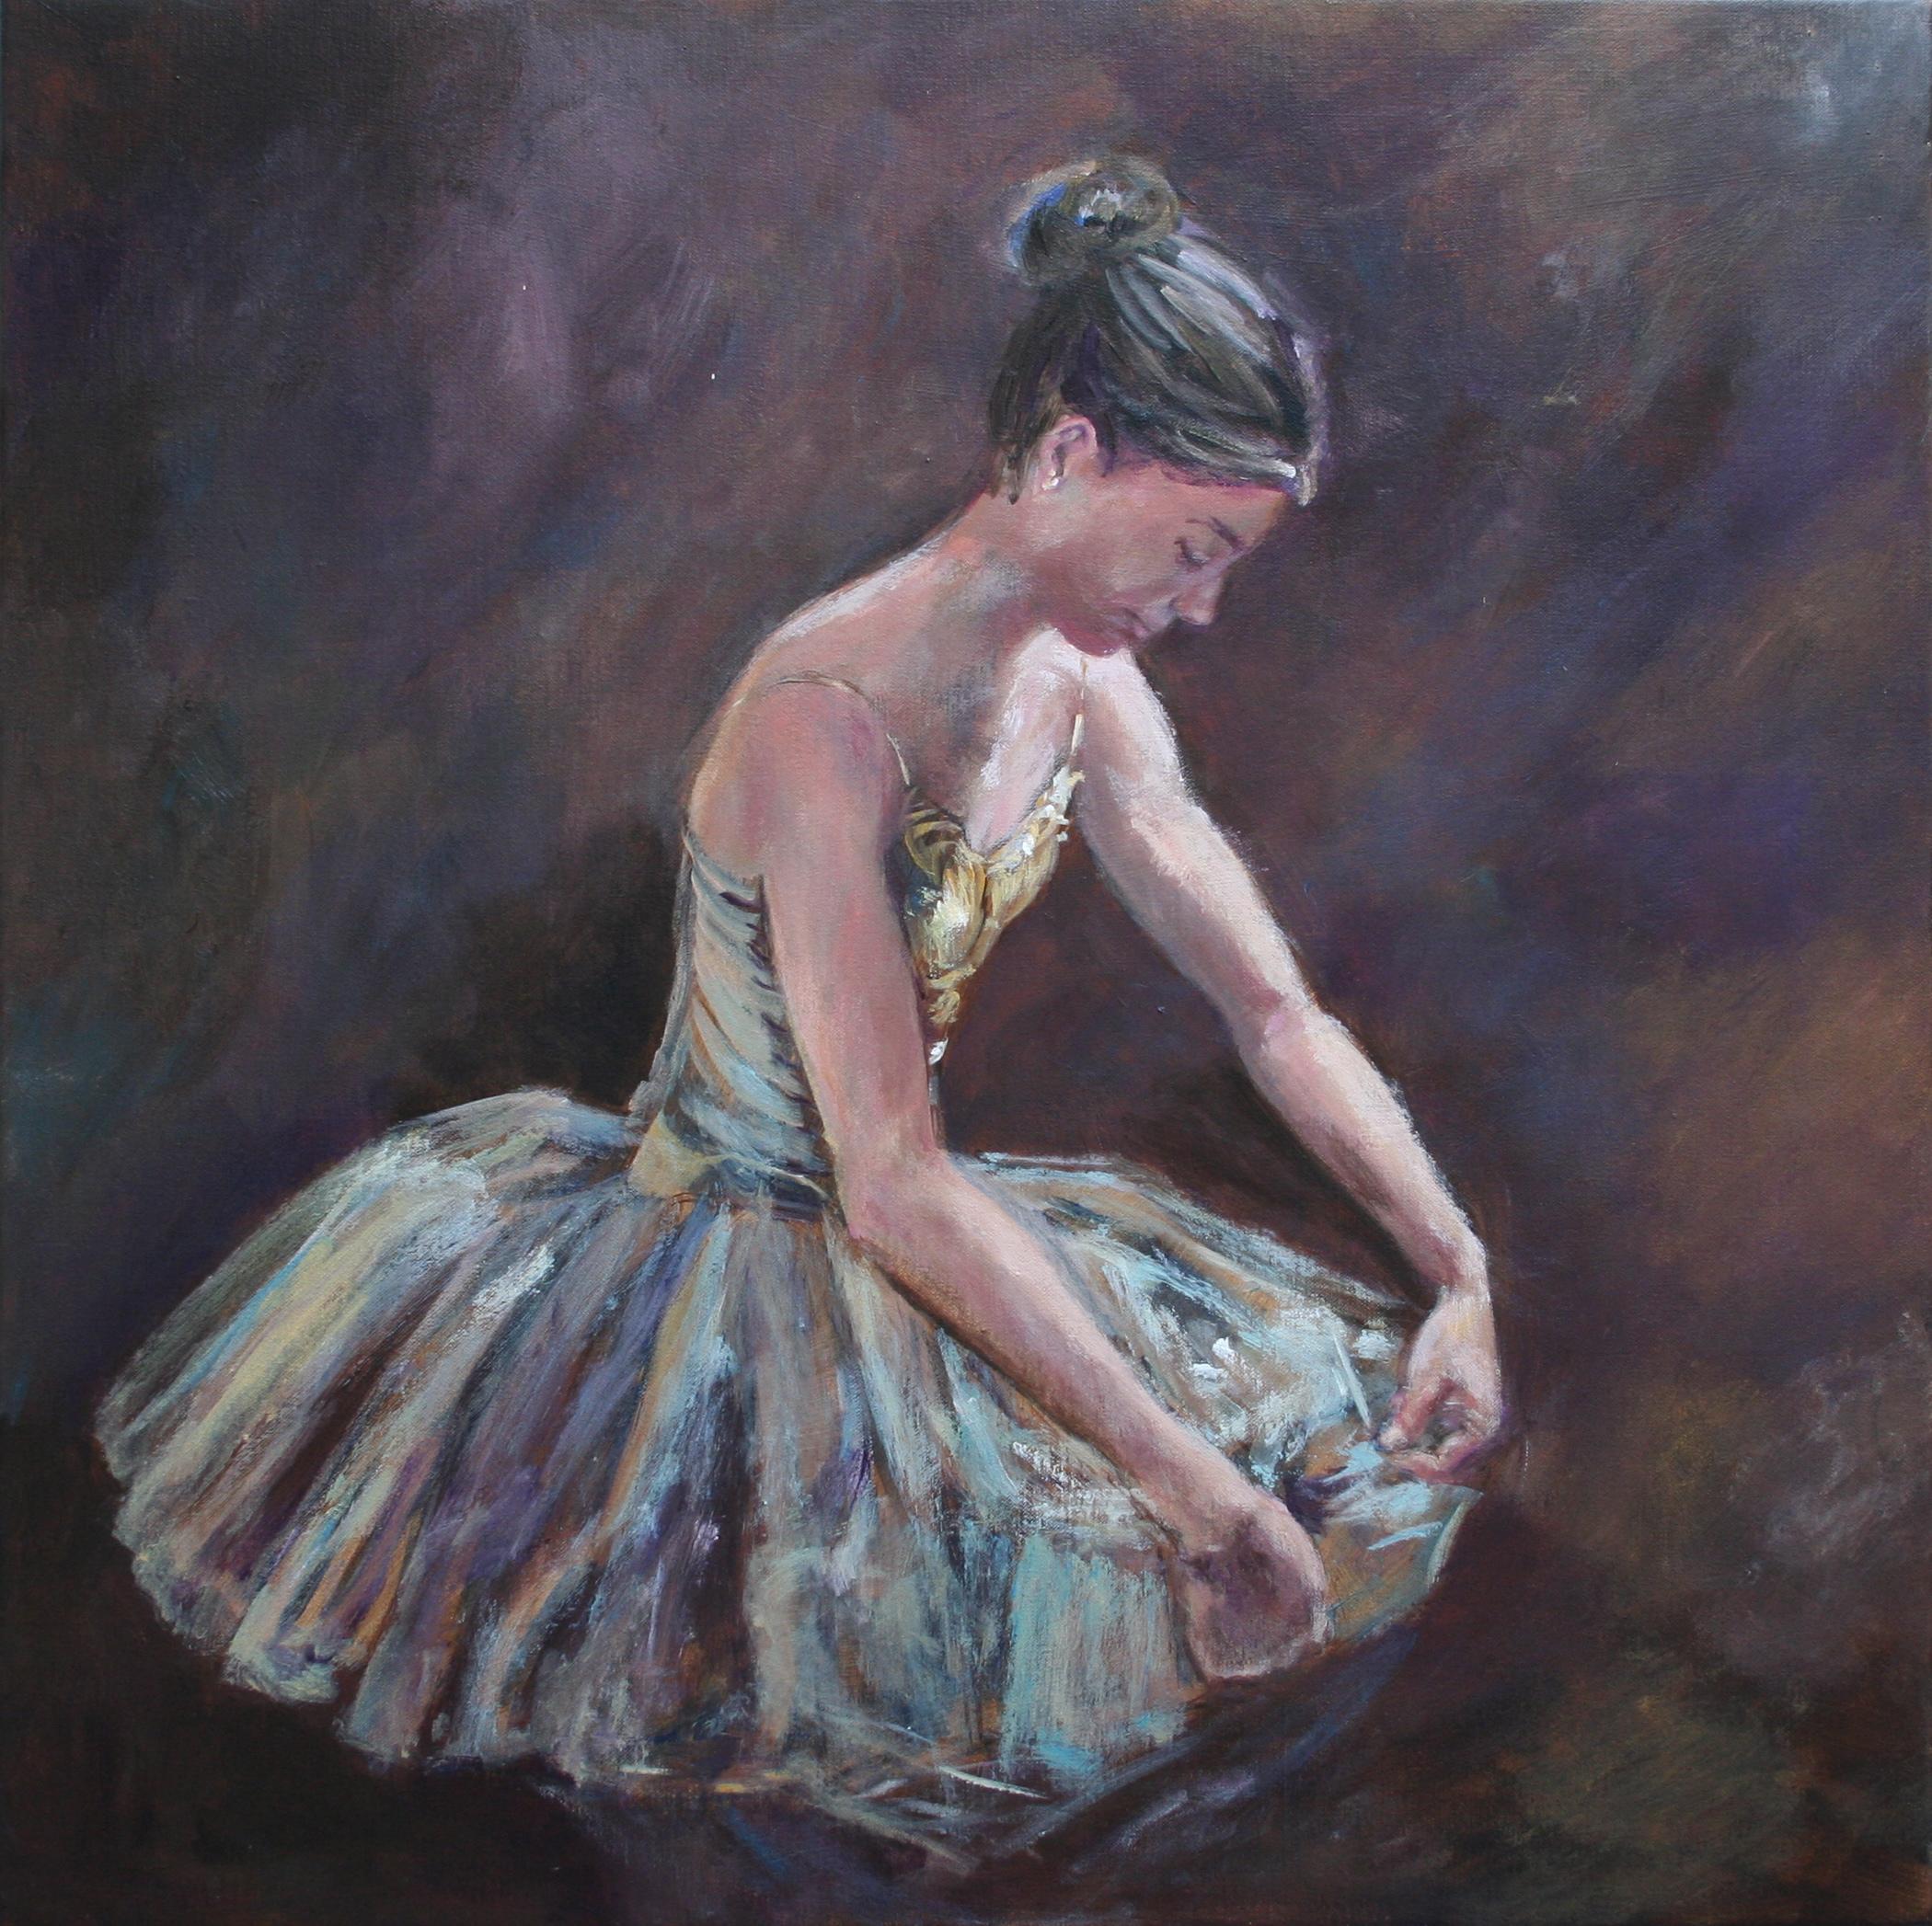 'Danseres' Acryl op linnen 60x60 cm